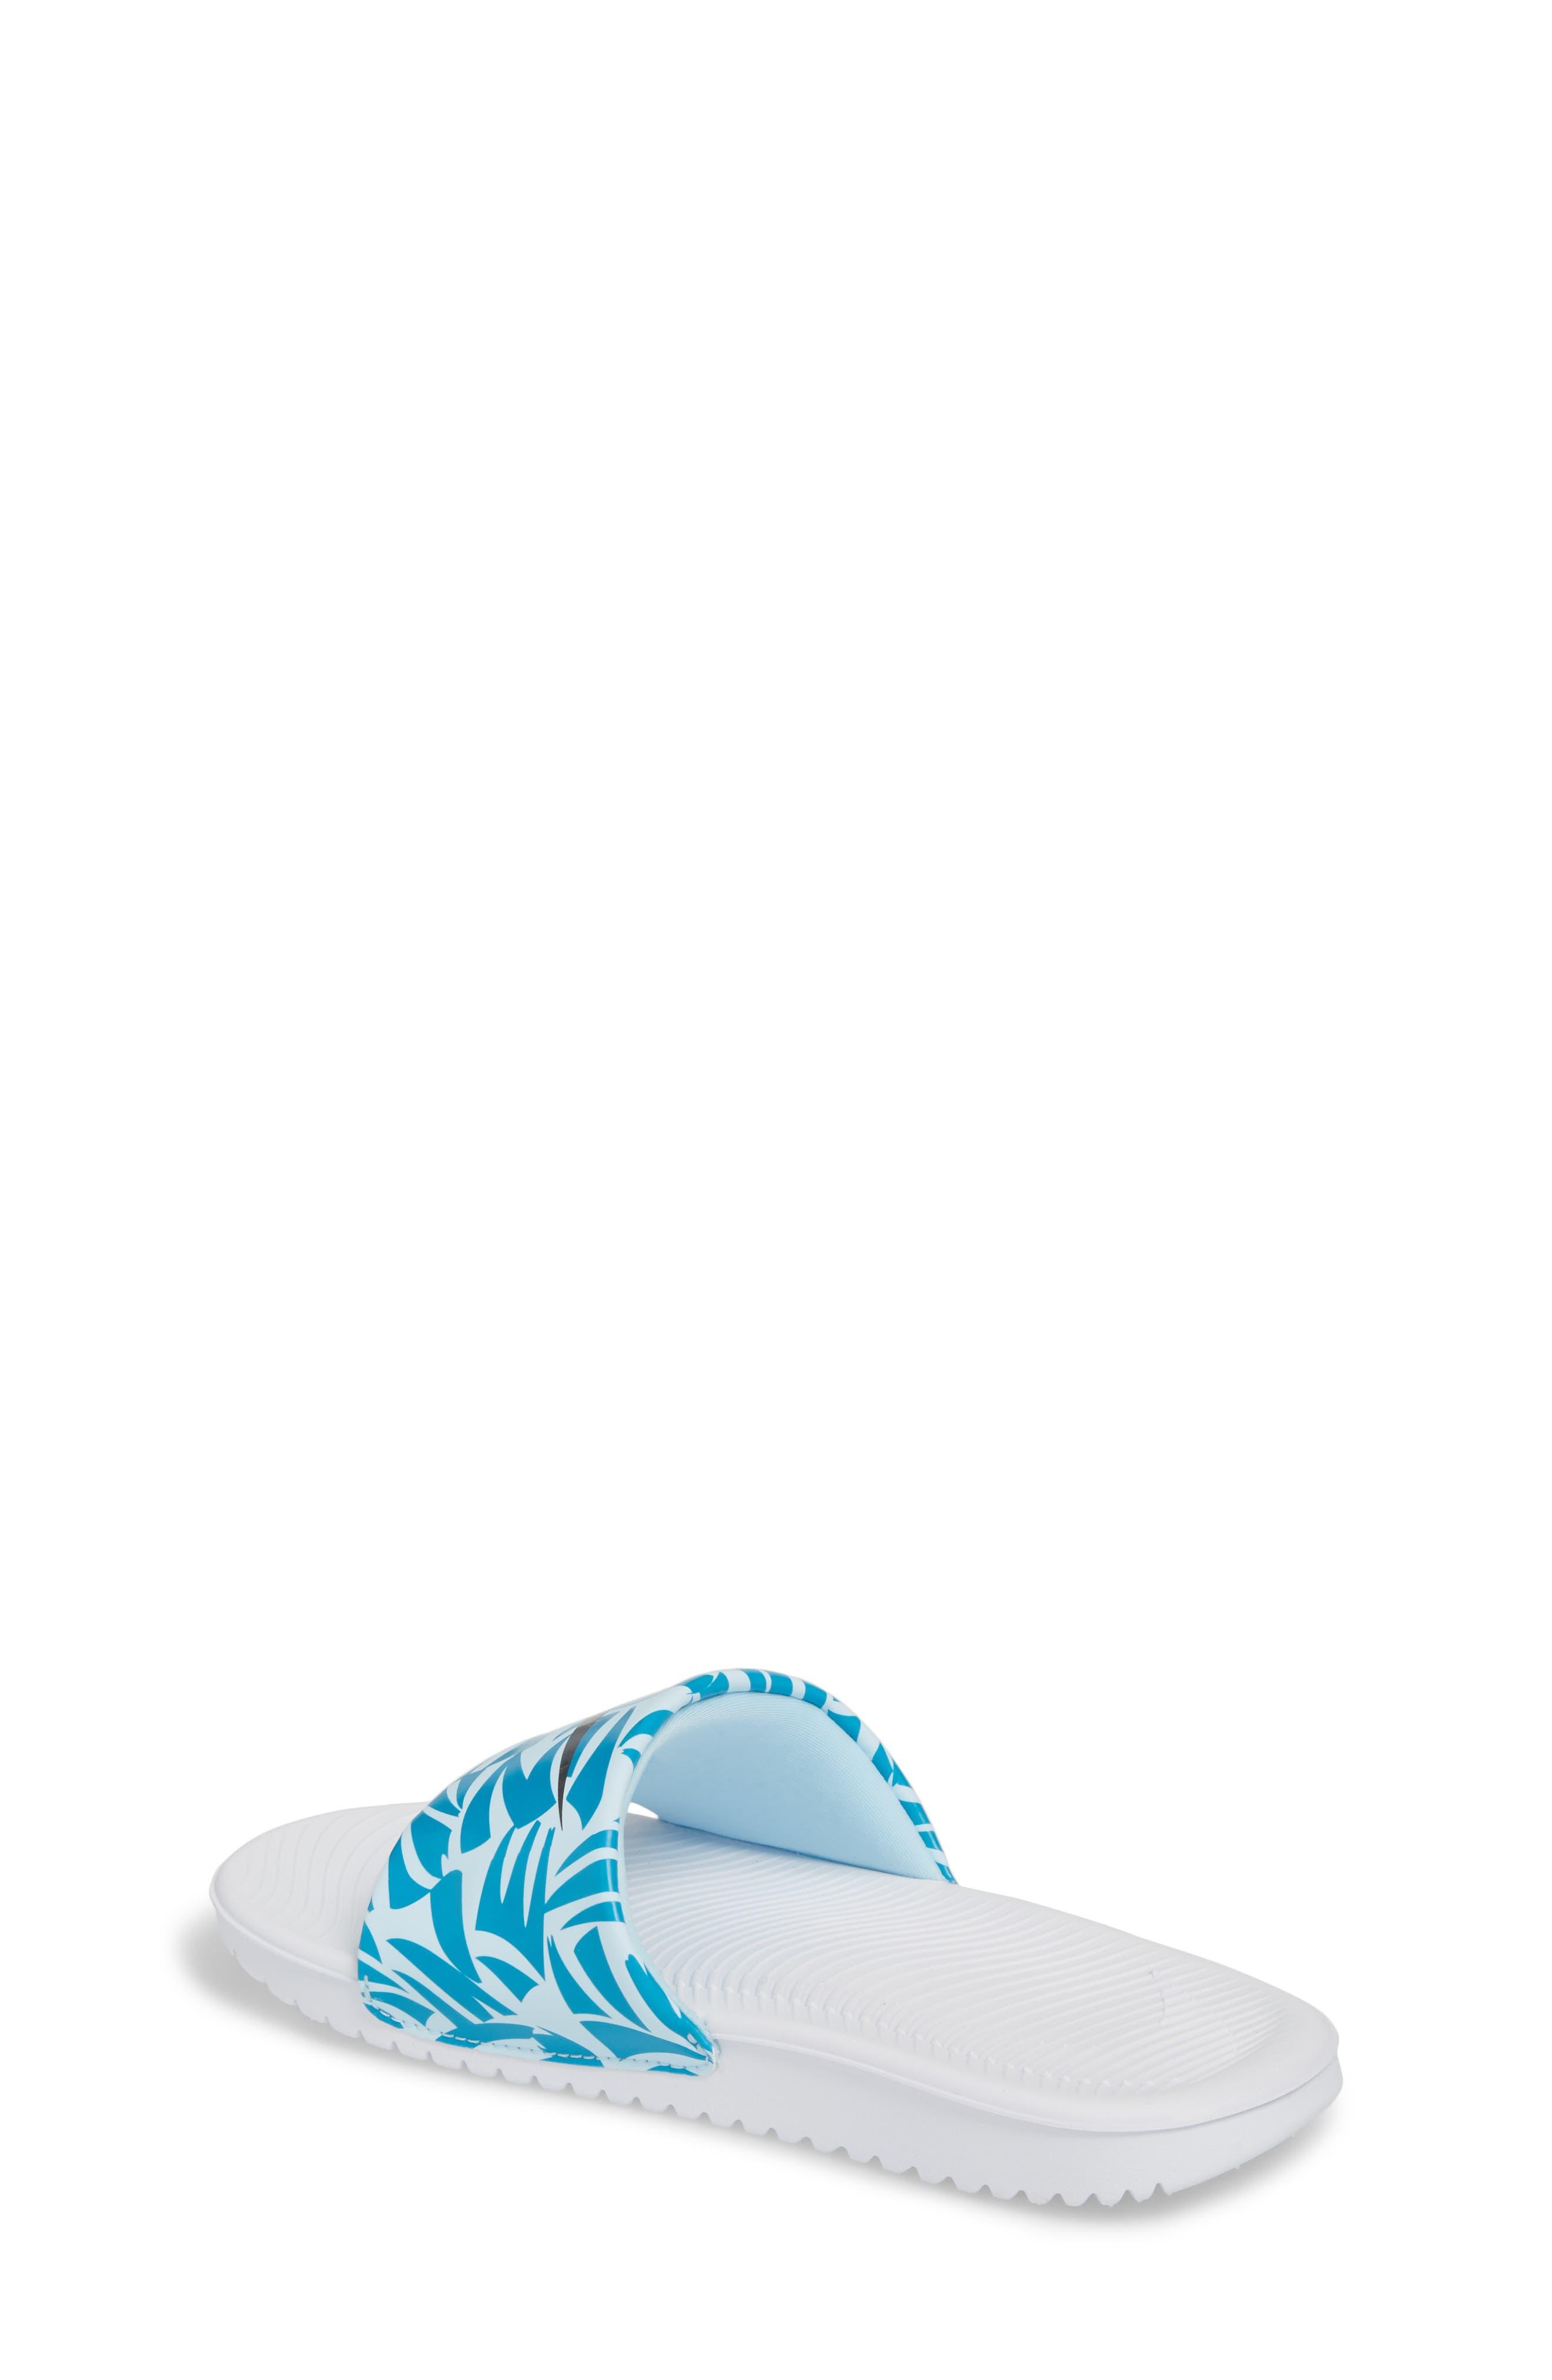 'Kawa' Print Slide Sandal,                             Alternate thumbnail 7, color,